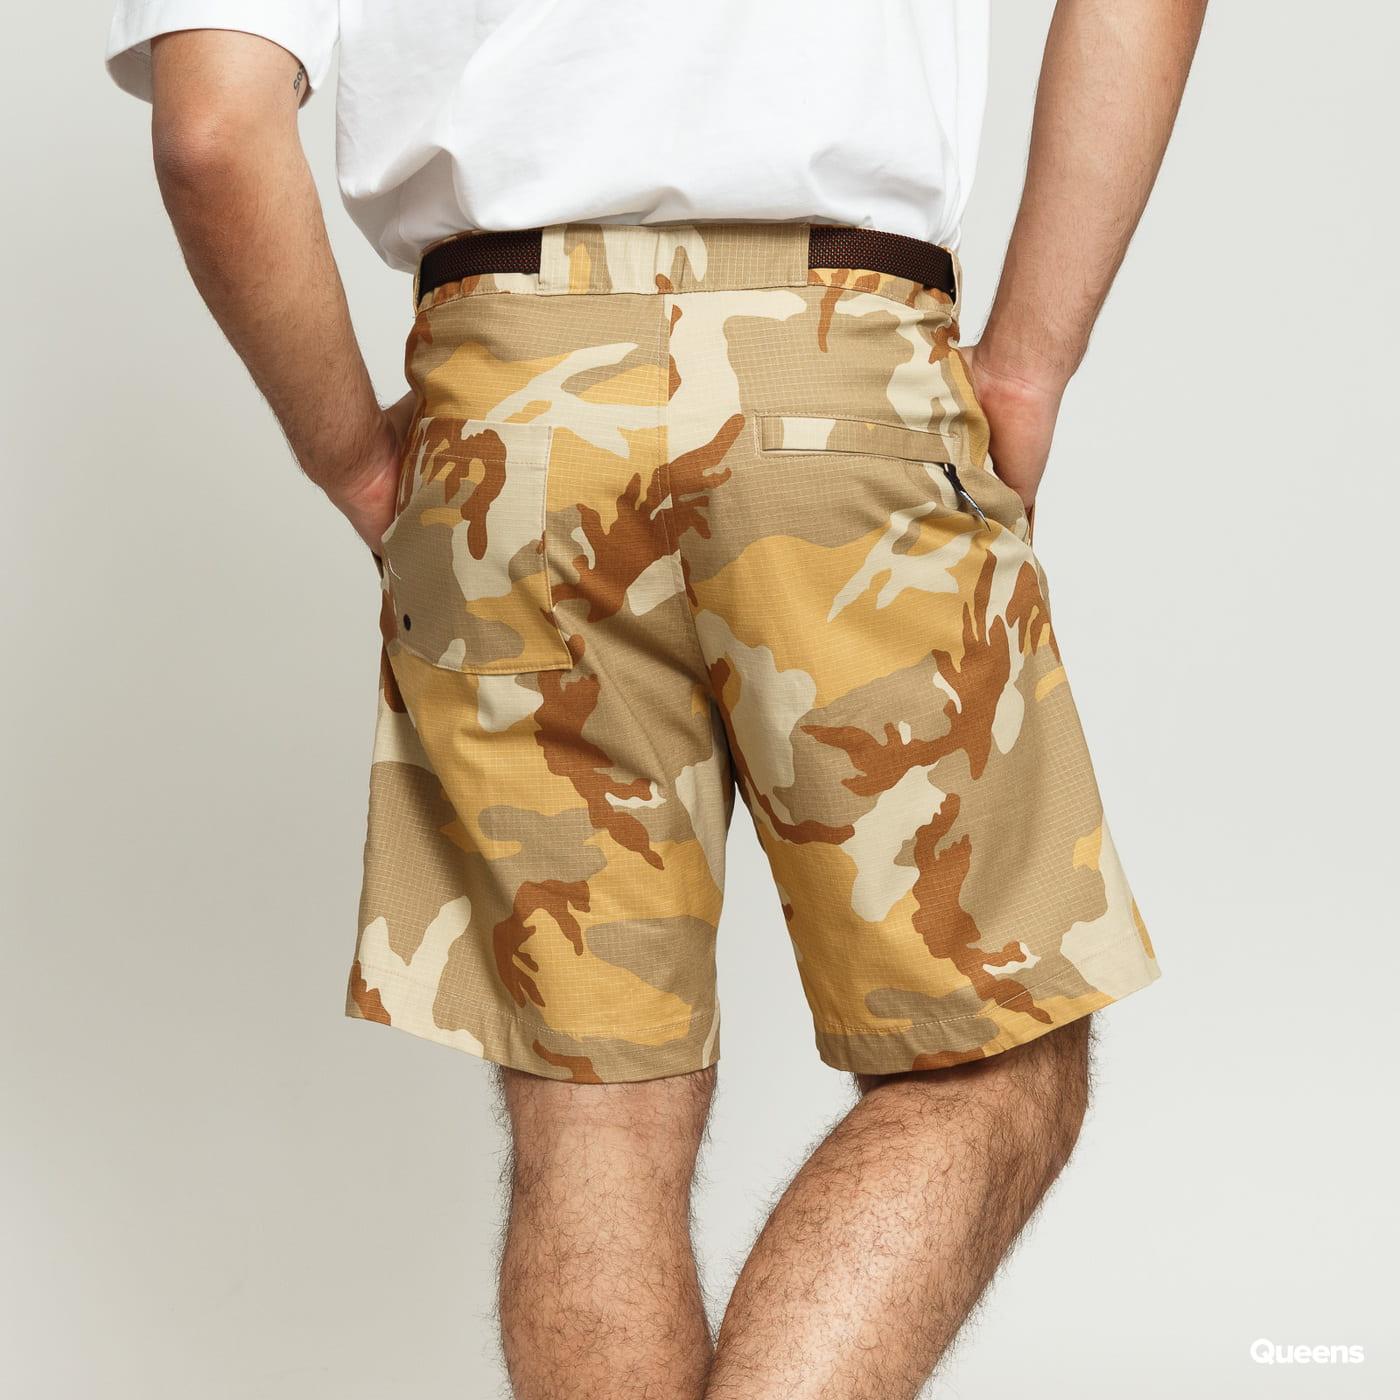 Nike M NK SB Short Rip Erdl camo brown / beige